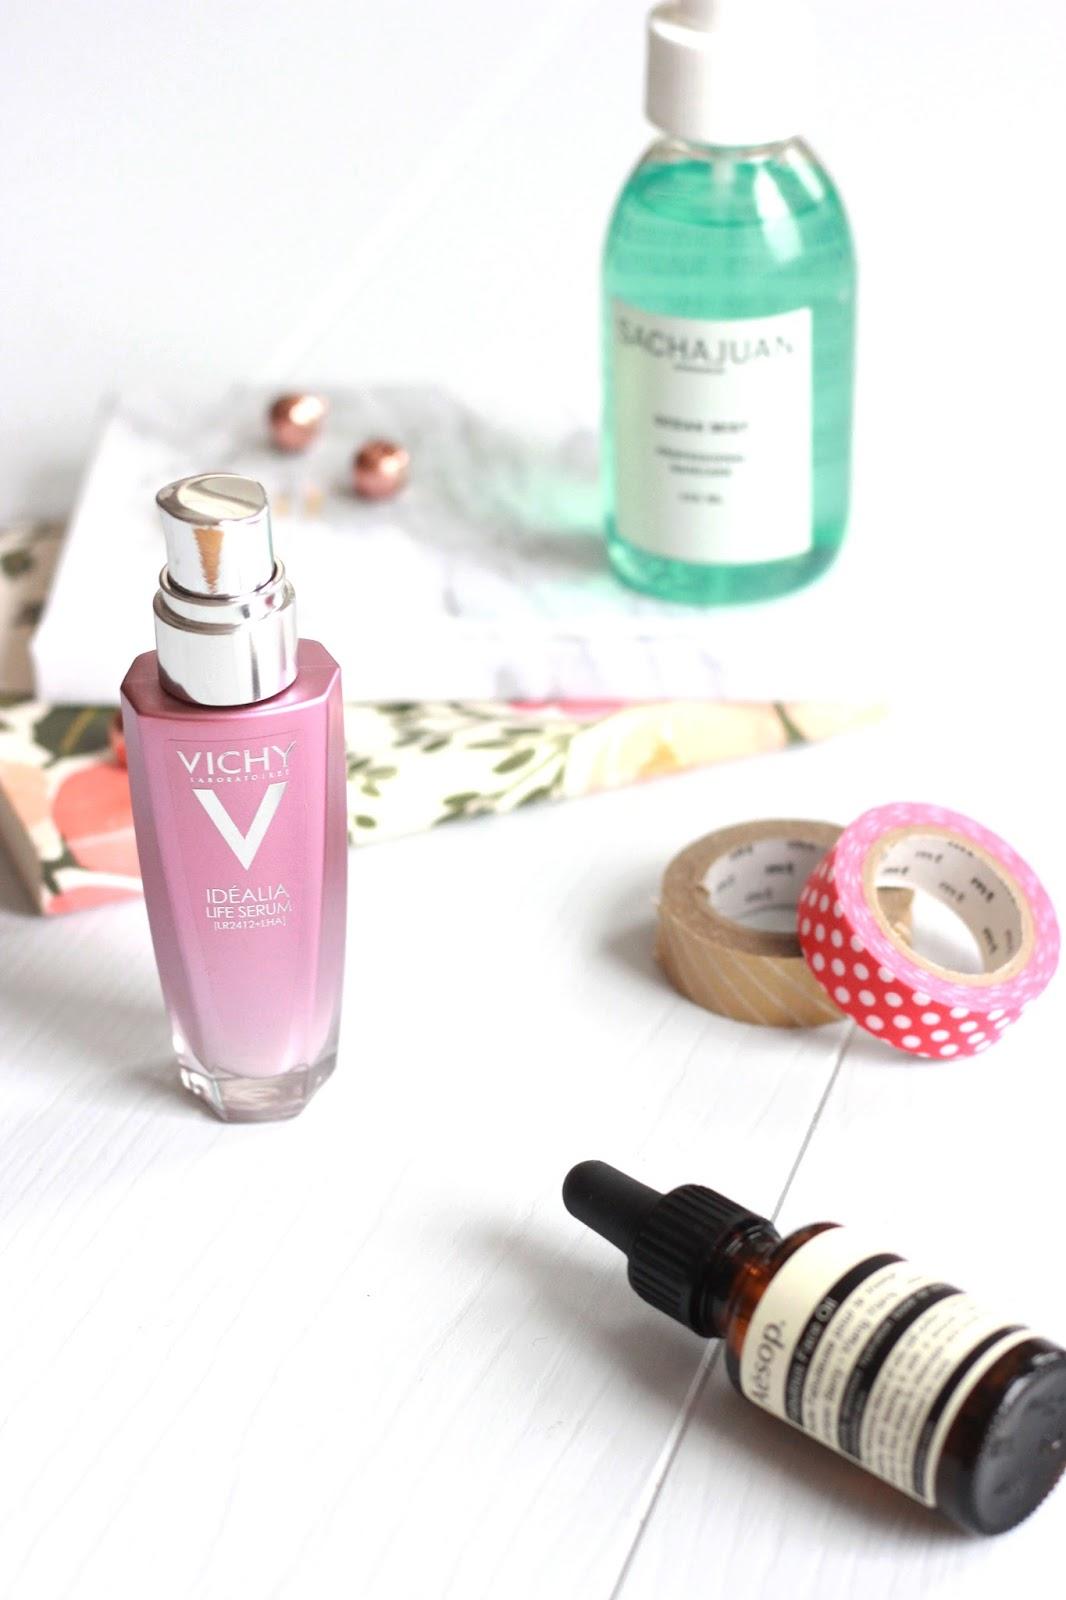 Aesop Fabulous Facial Oil, Vichy Idealia Serum, Sachajuan Ocean Mist